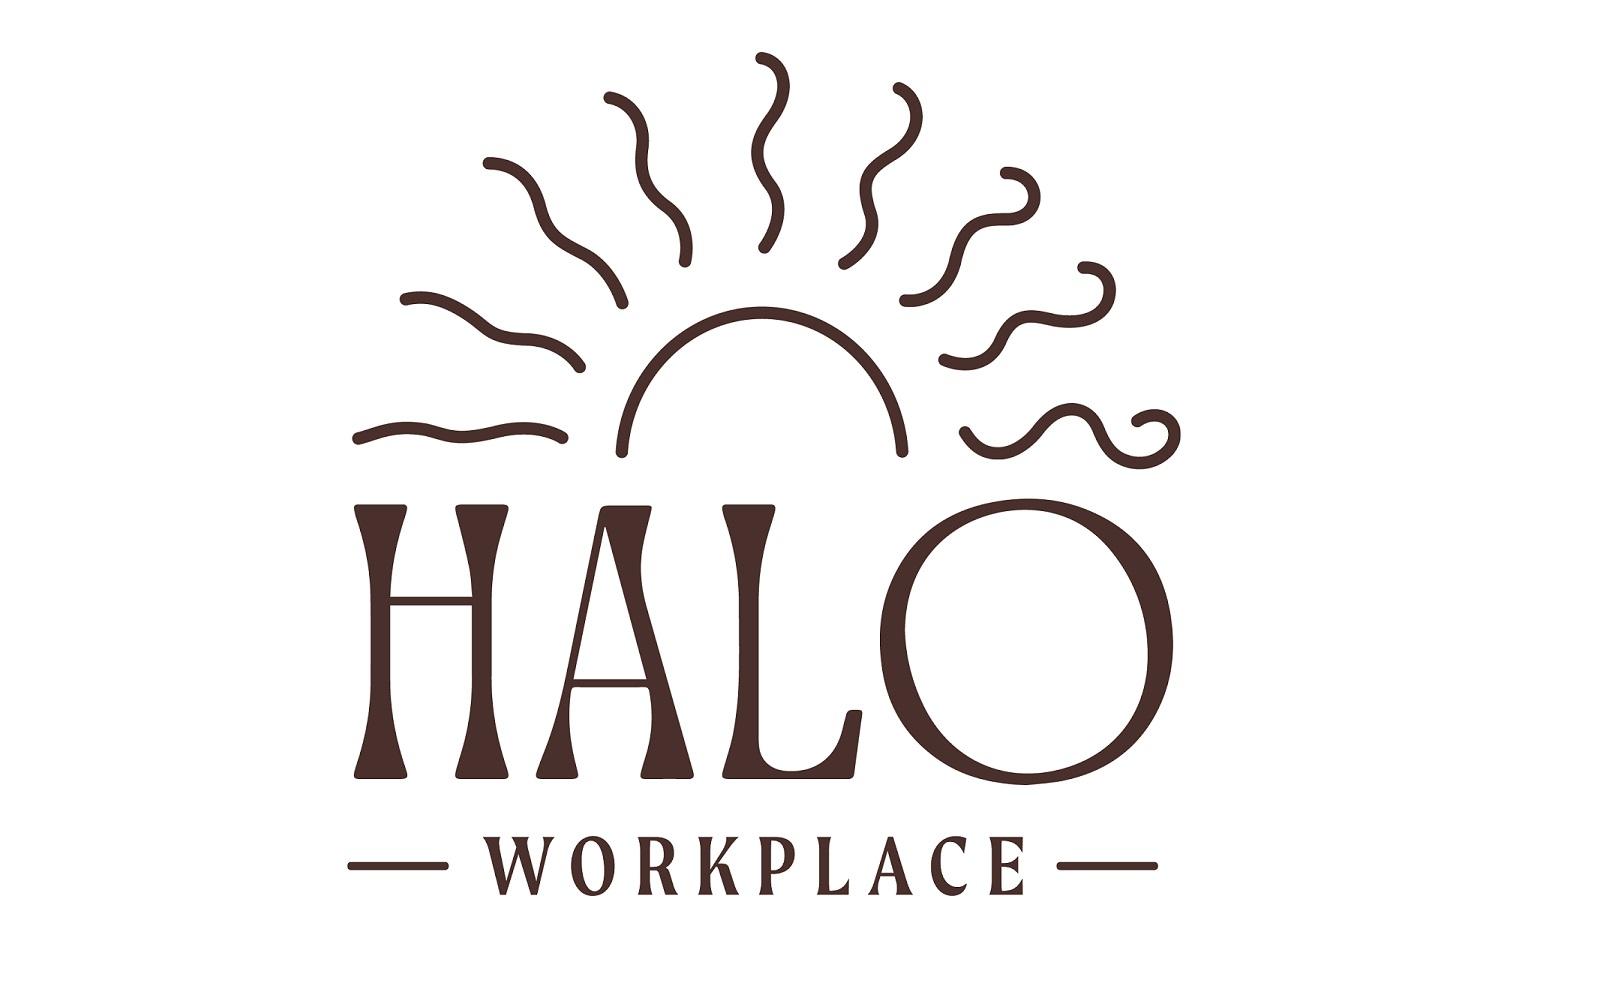 Championing The Halo Code!